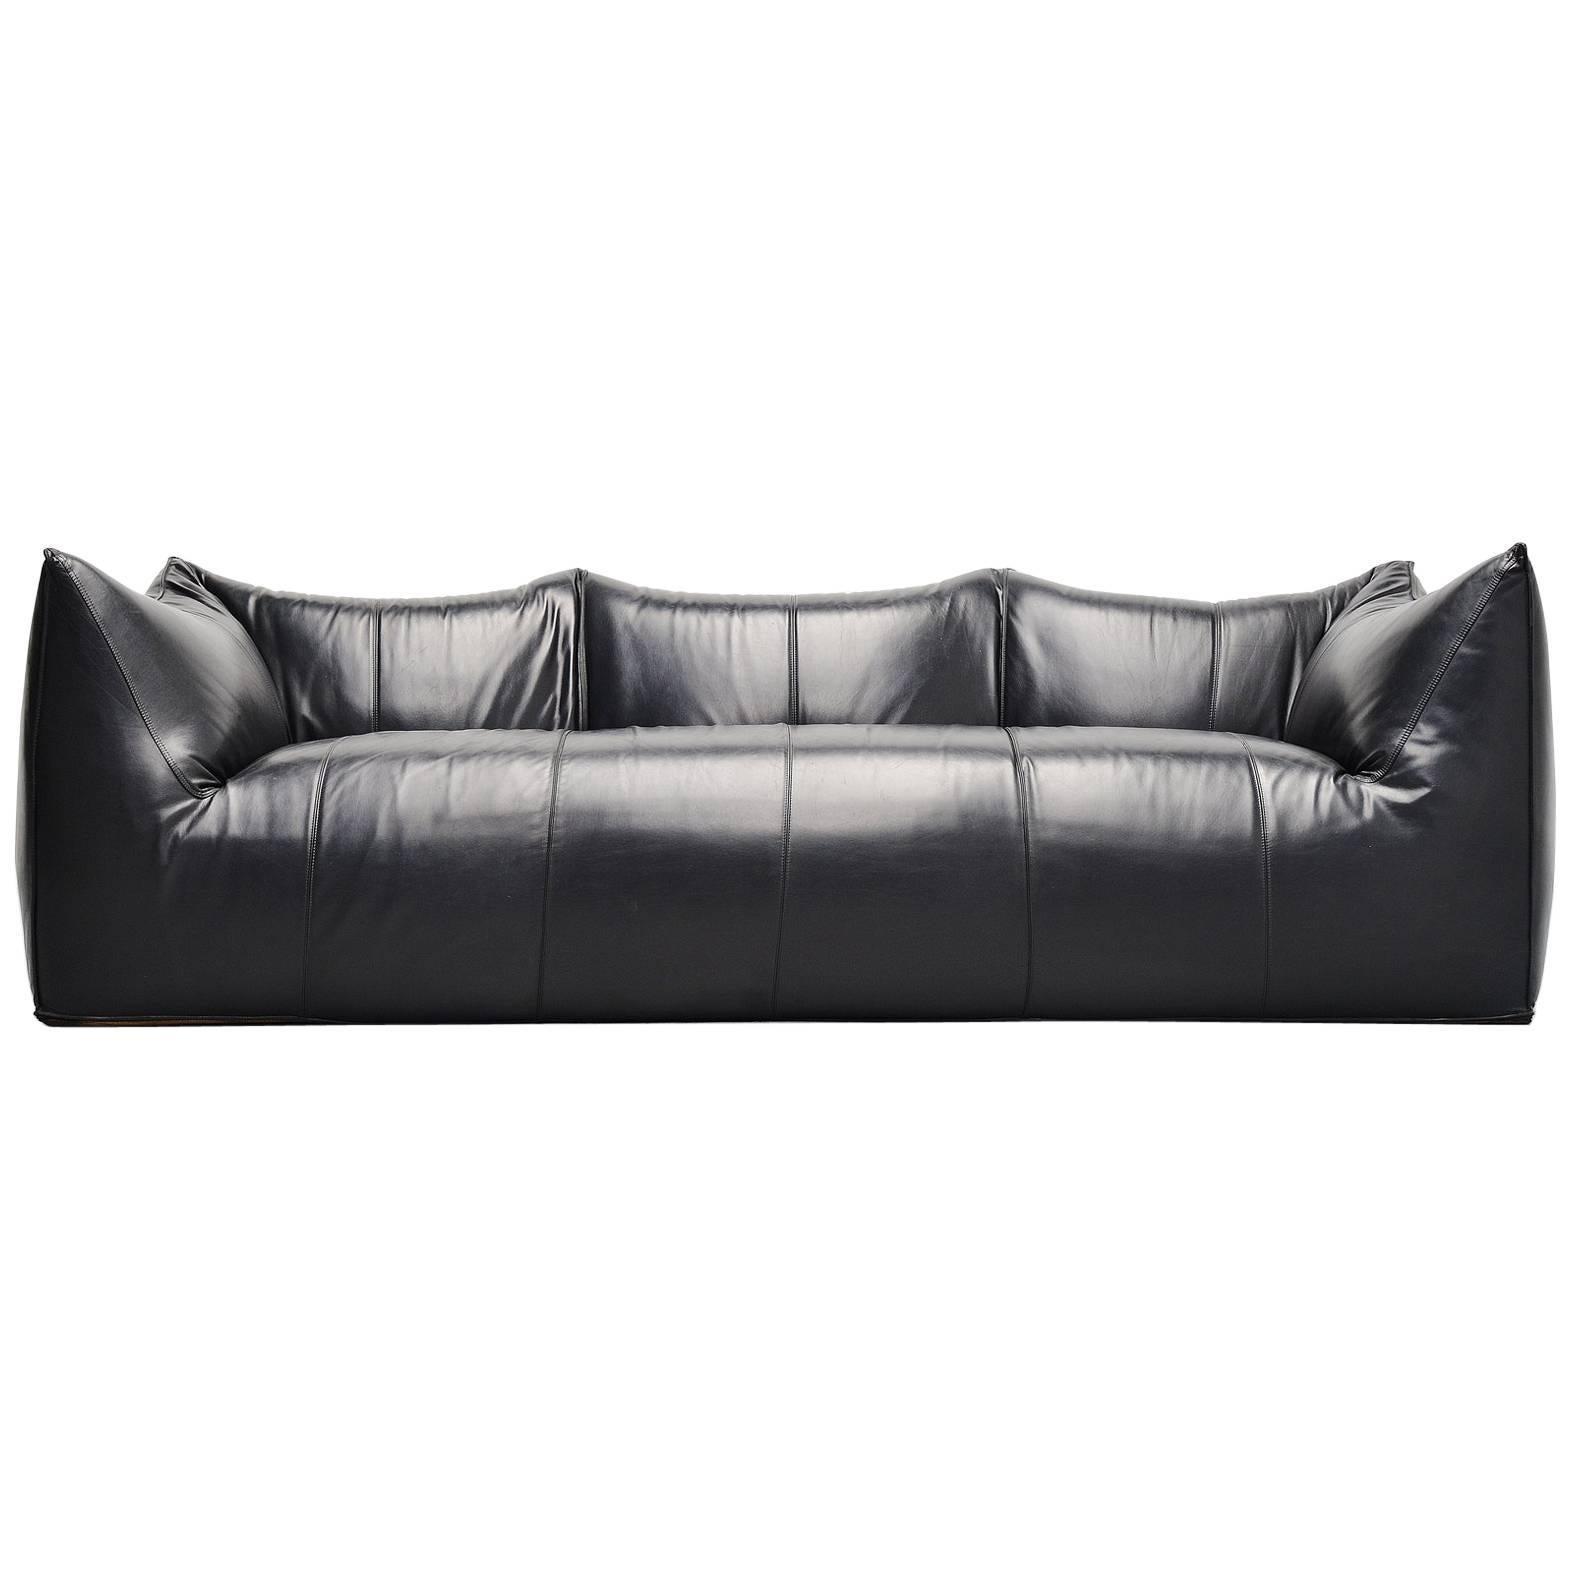 Mario Bellini Bambole Sofa Black Bu0026B Italia, Italy, ...